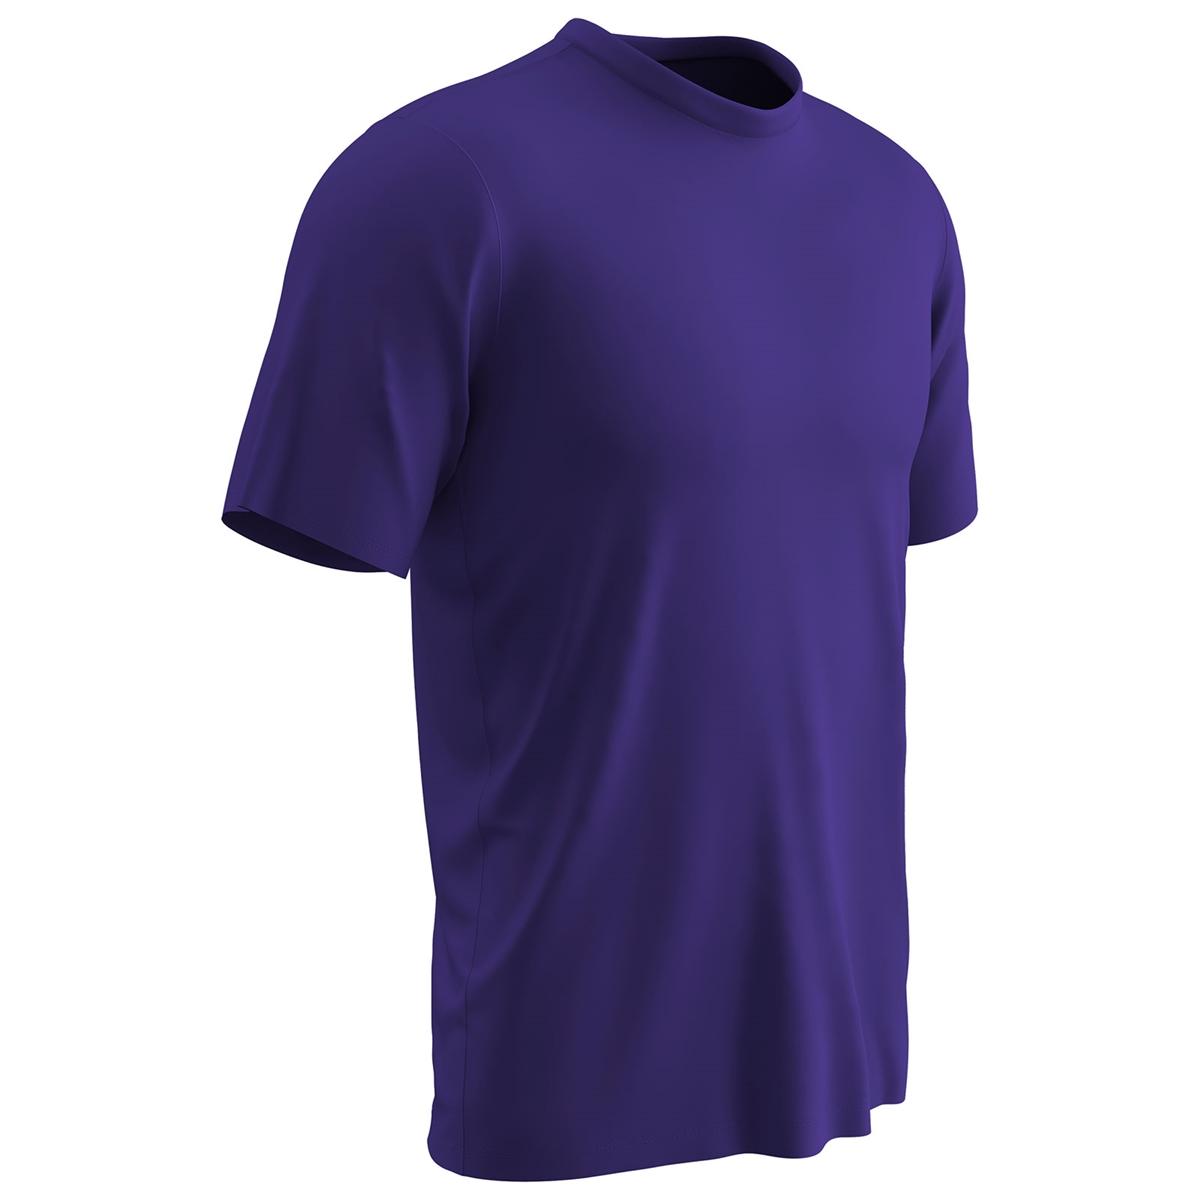 Vision T-Shirt Champro